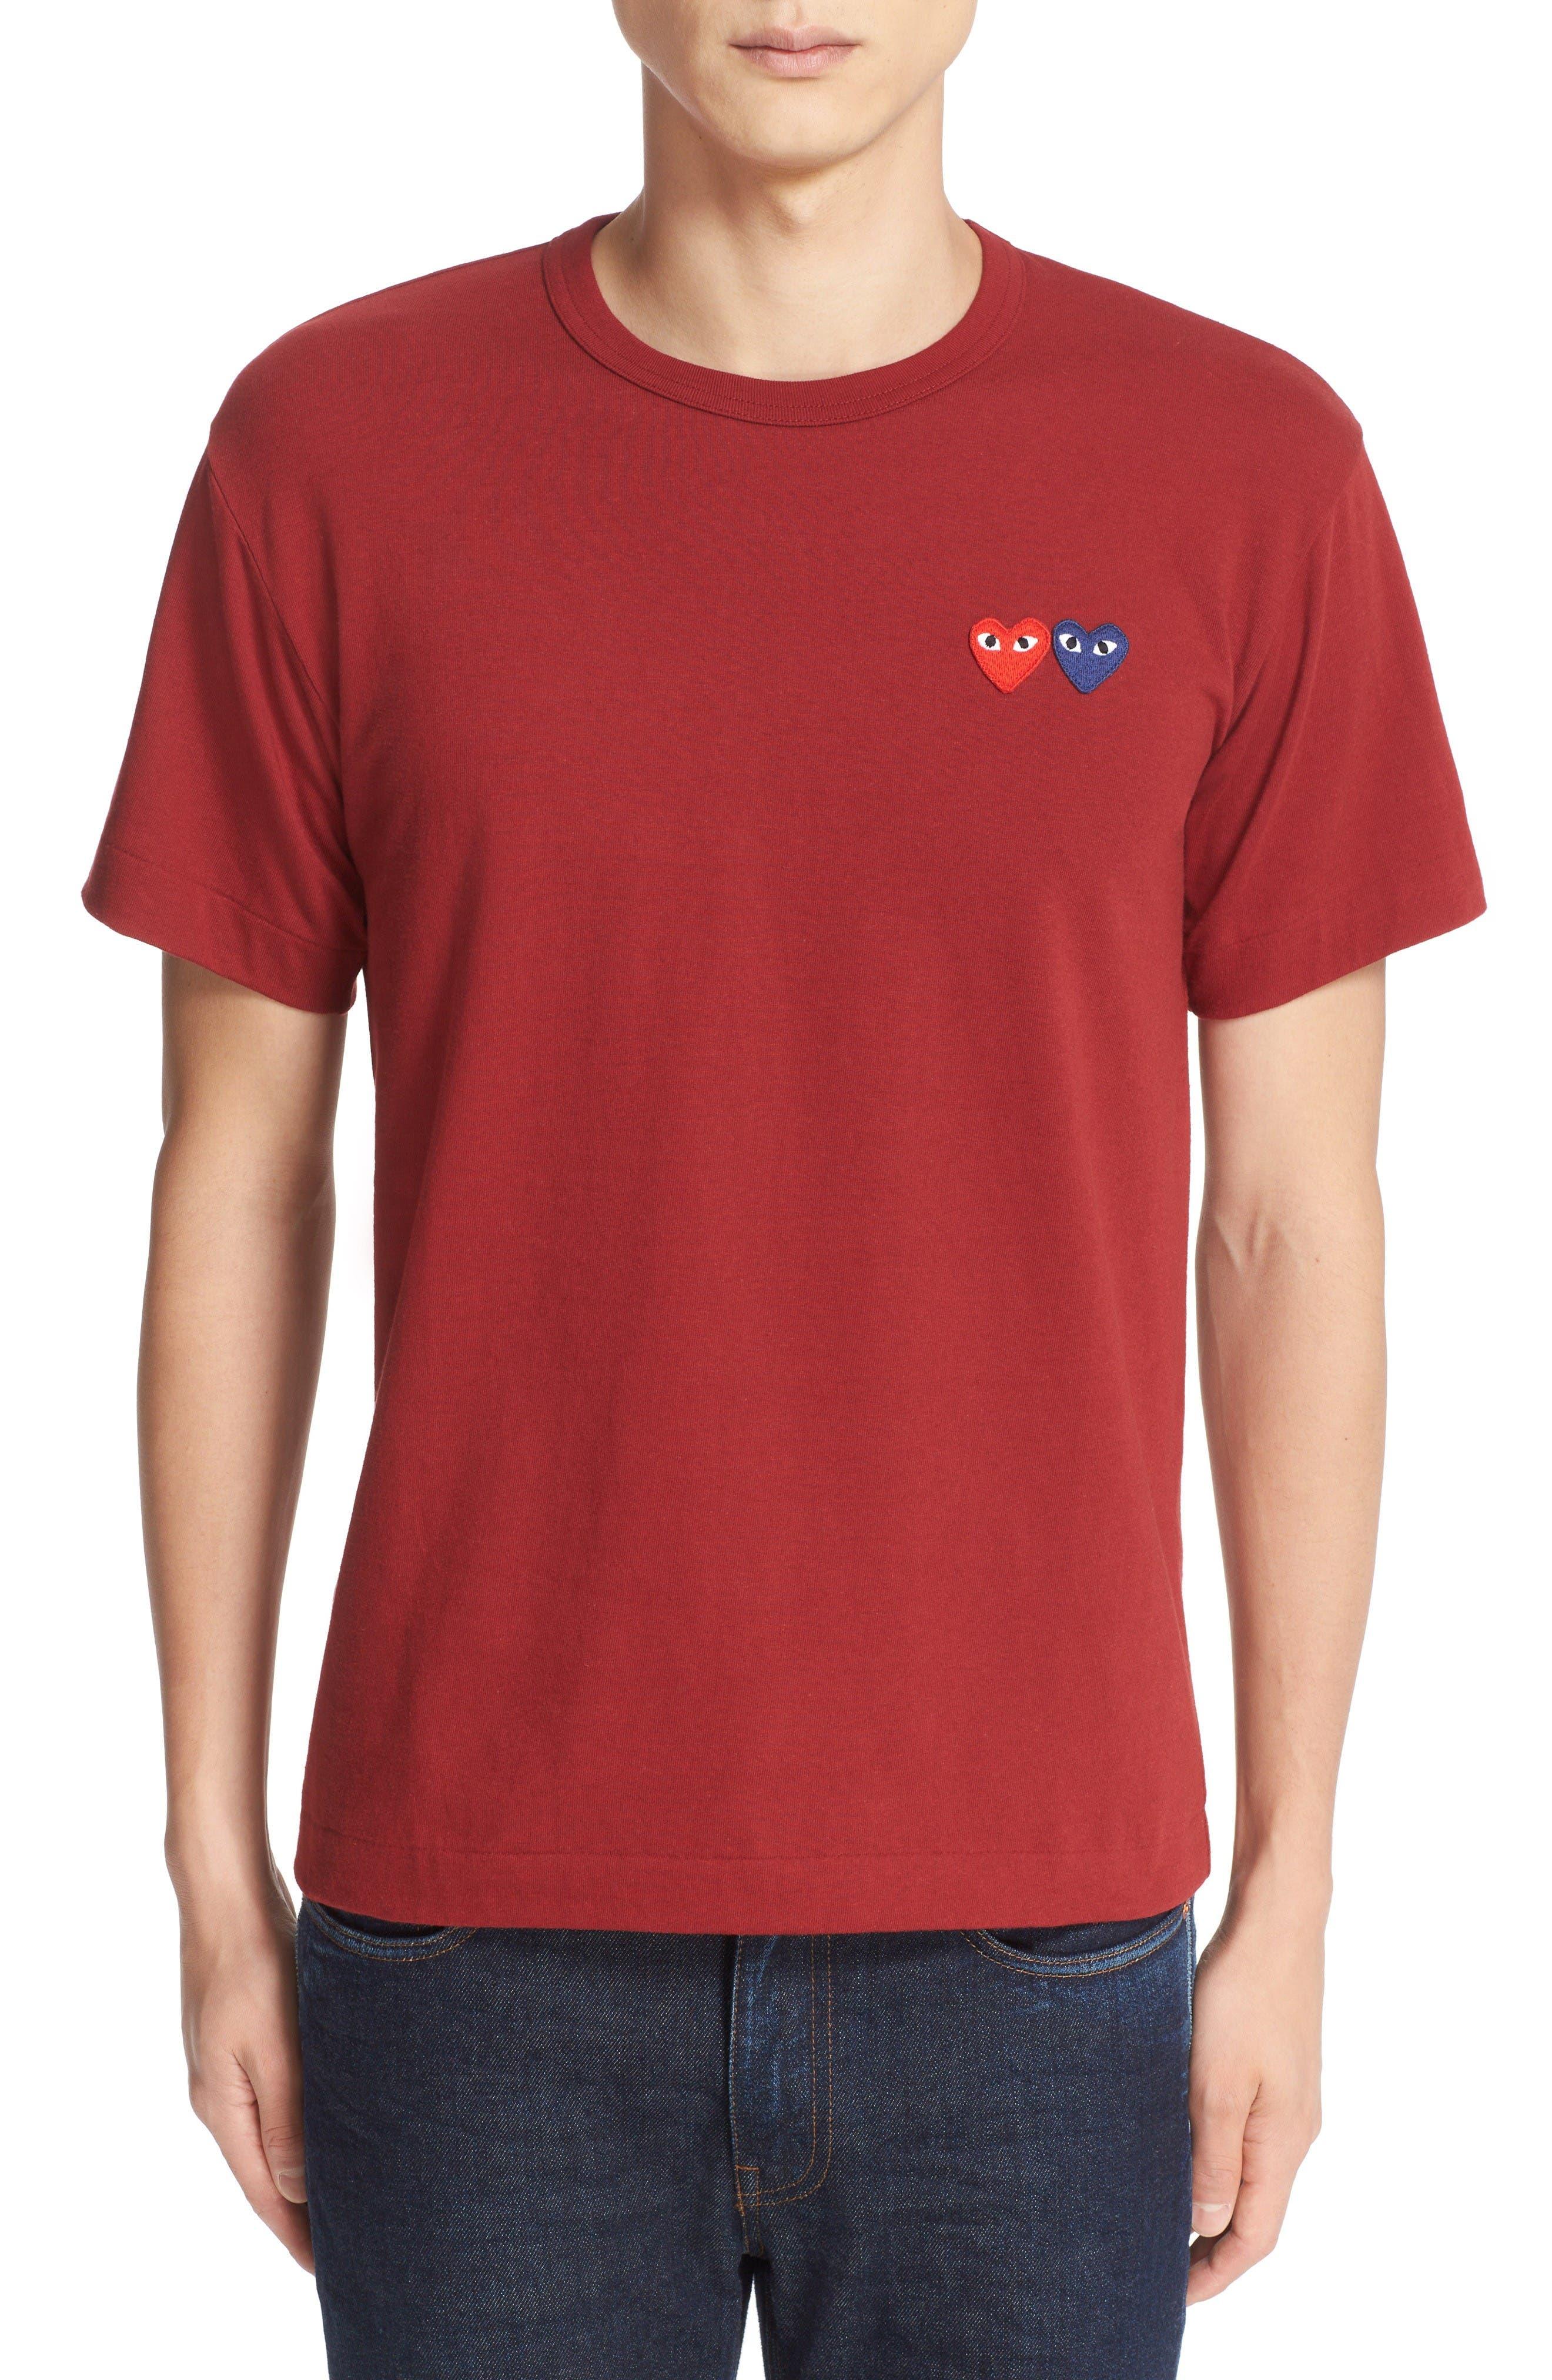 Main Image - Comme des Garçons PLAY Twin Hearts Jersey T-Shirt